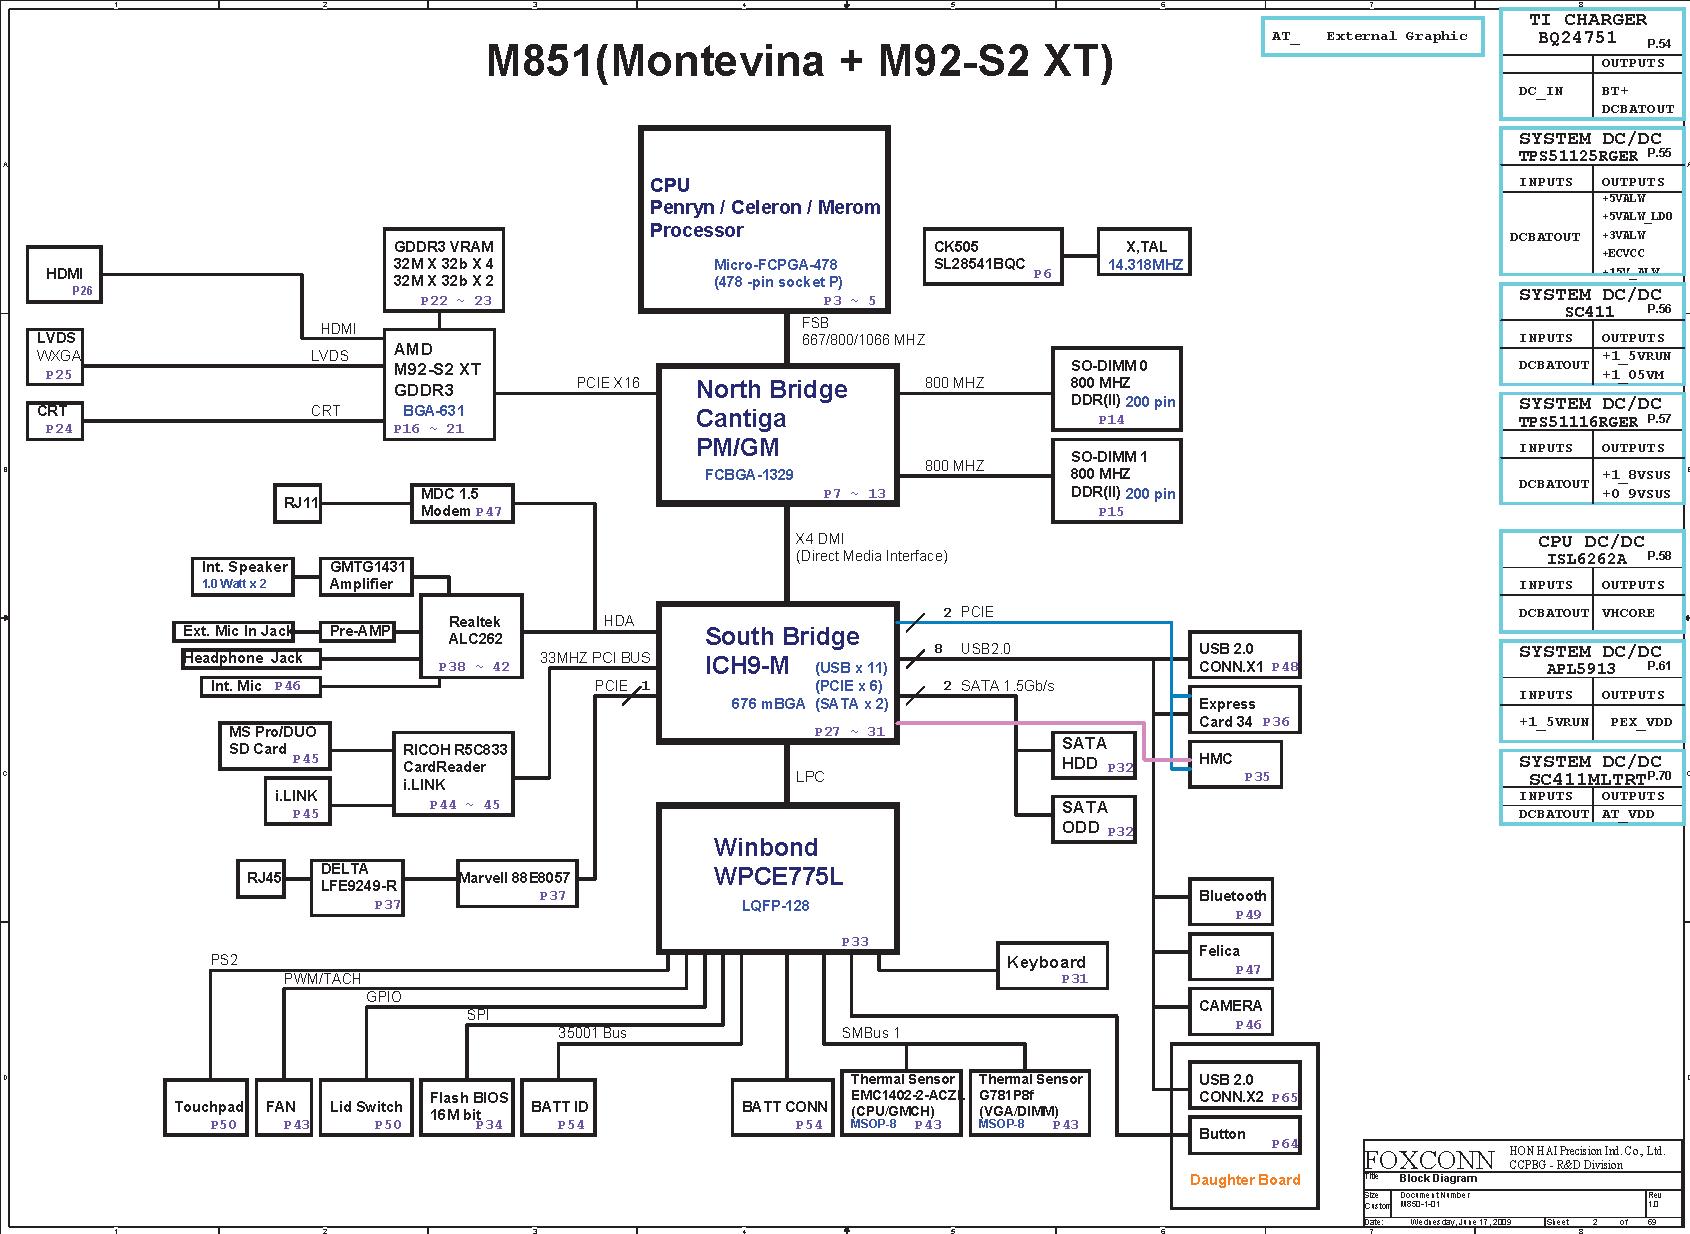 Sony M850-1-01 Schematics Block Diagram | Free Schematic Diagram